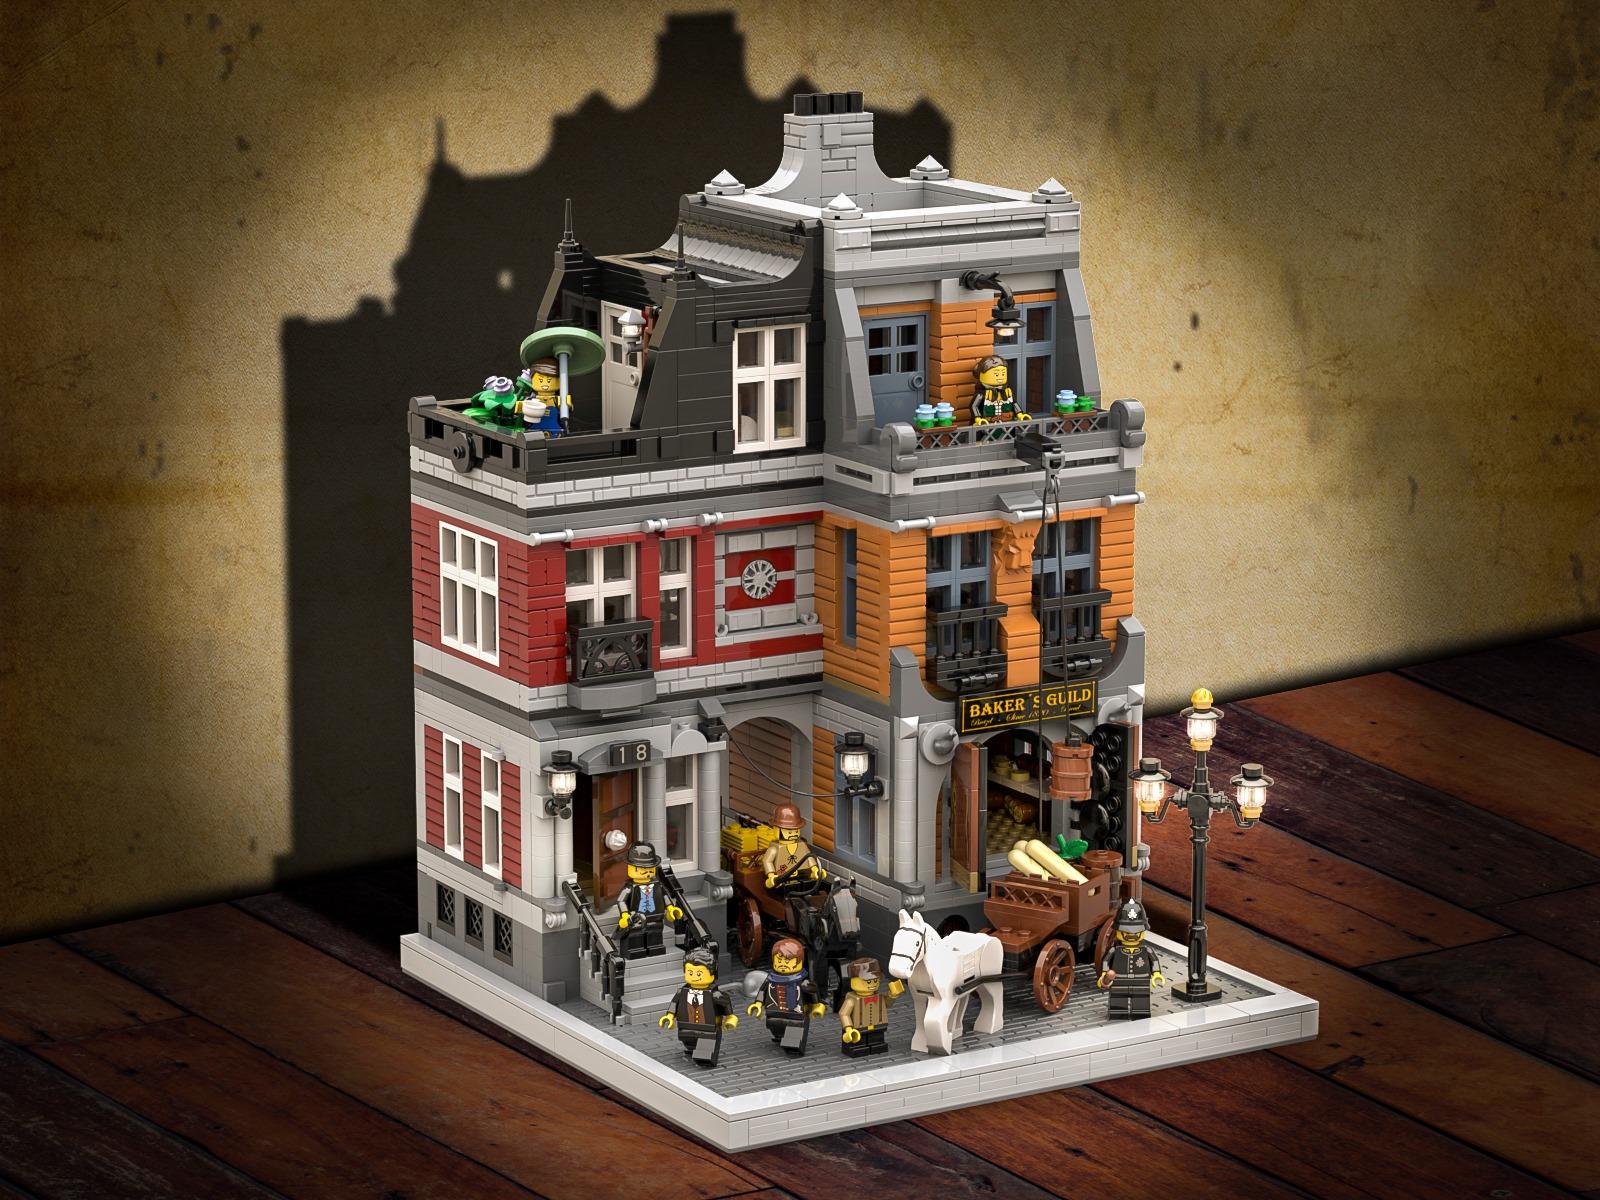 lego-ideas-the-bakery-historische-baeckerei-paoko-sanchez zusammengebaut.com